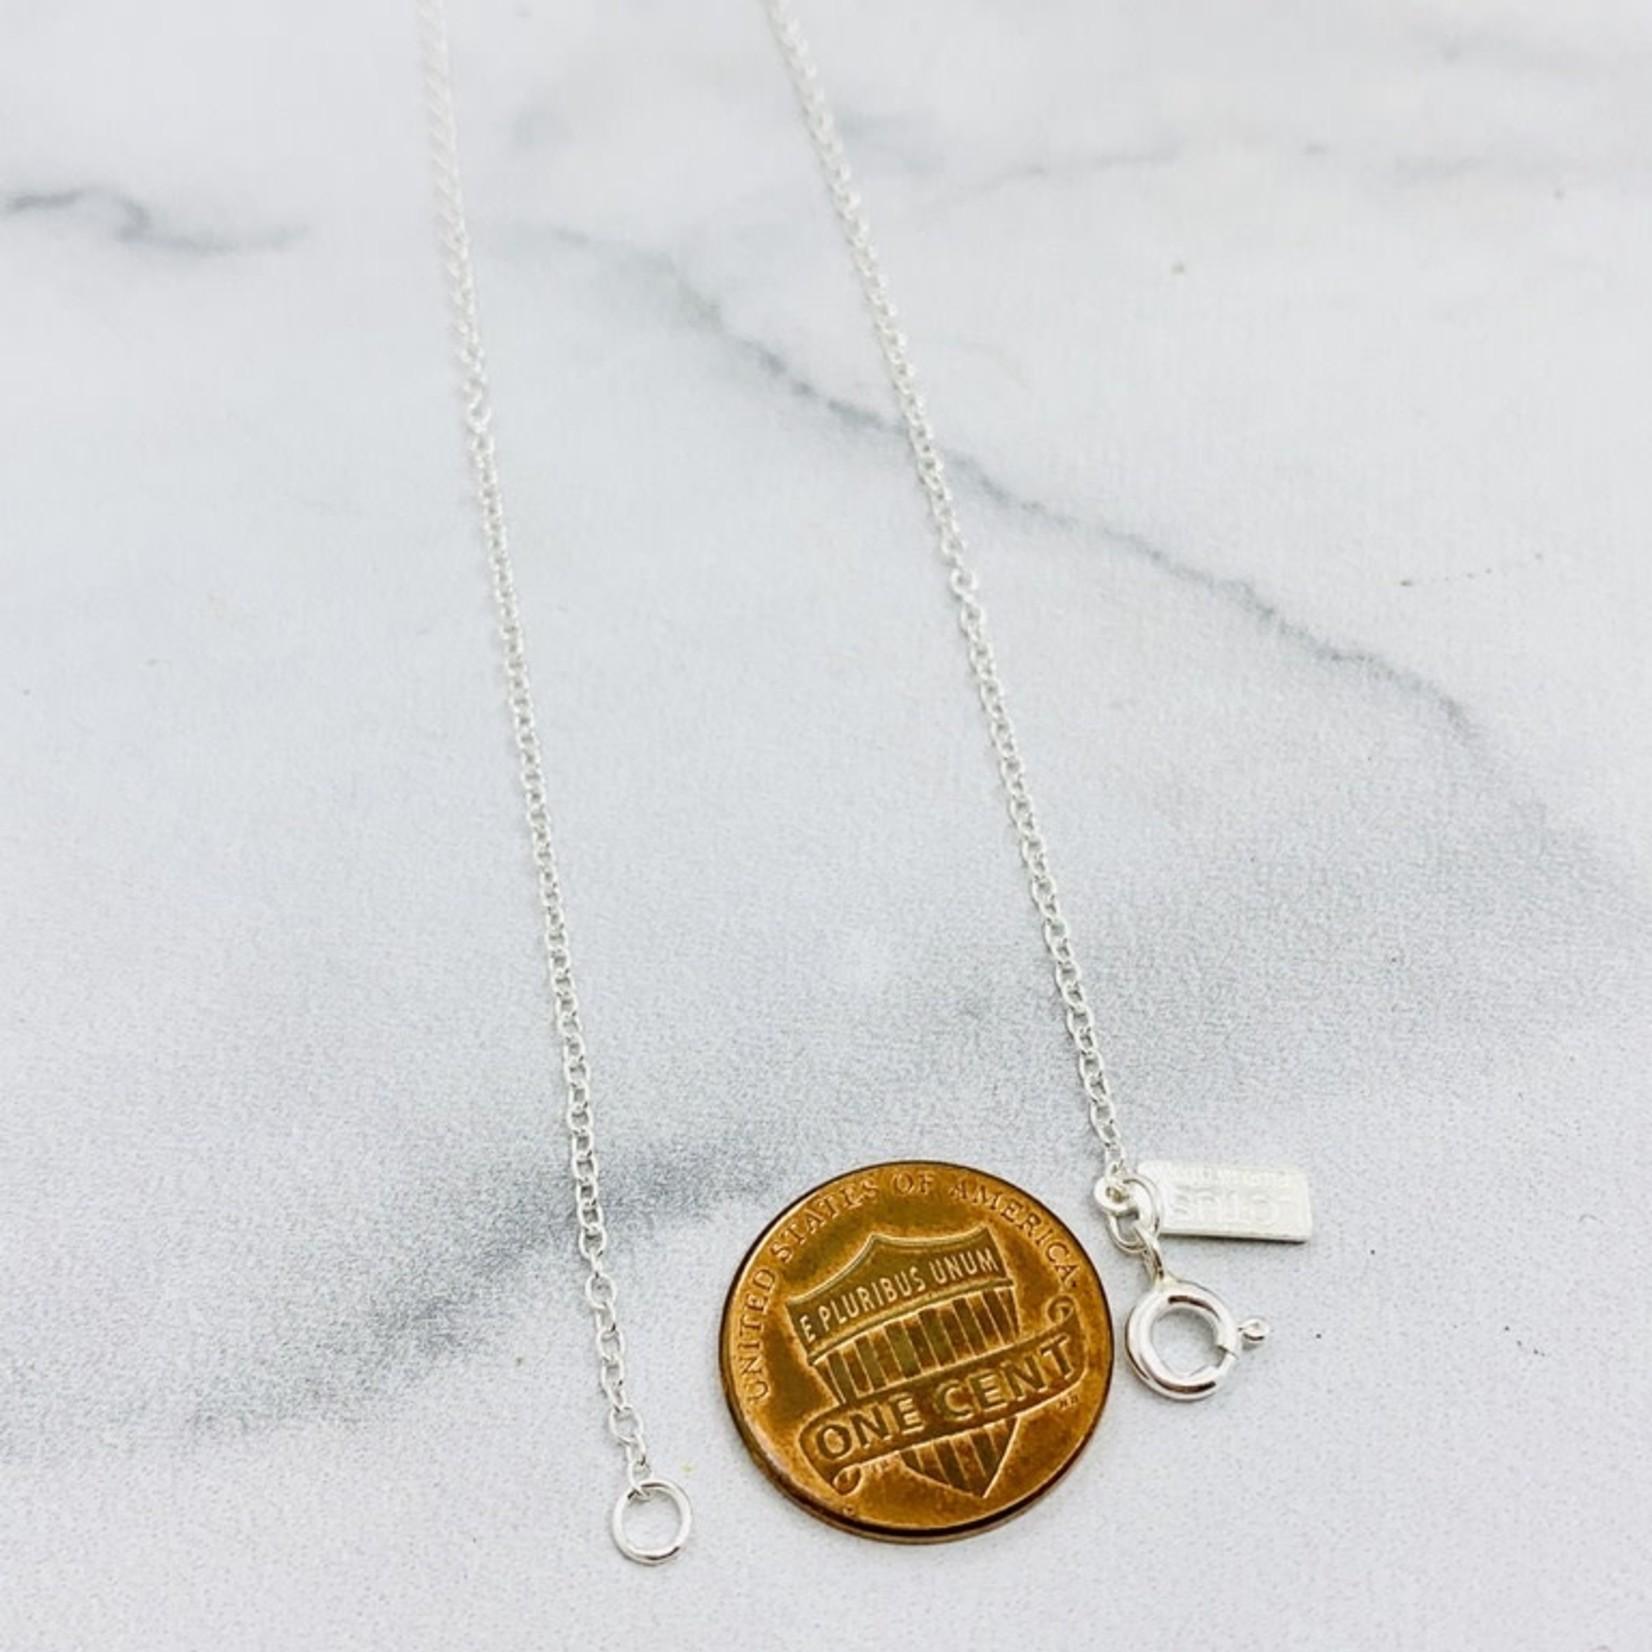 Sterling Silver Celeste Necklace